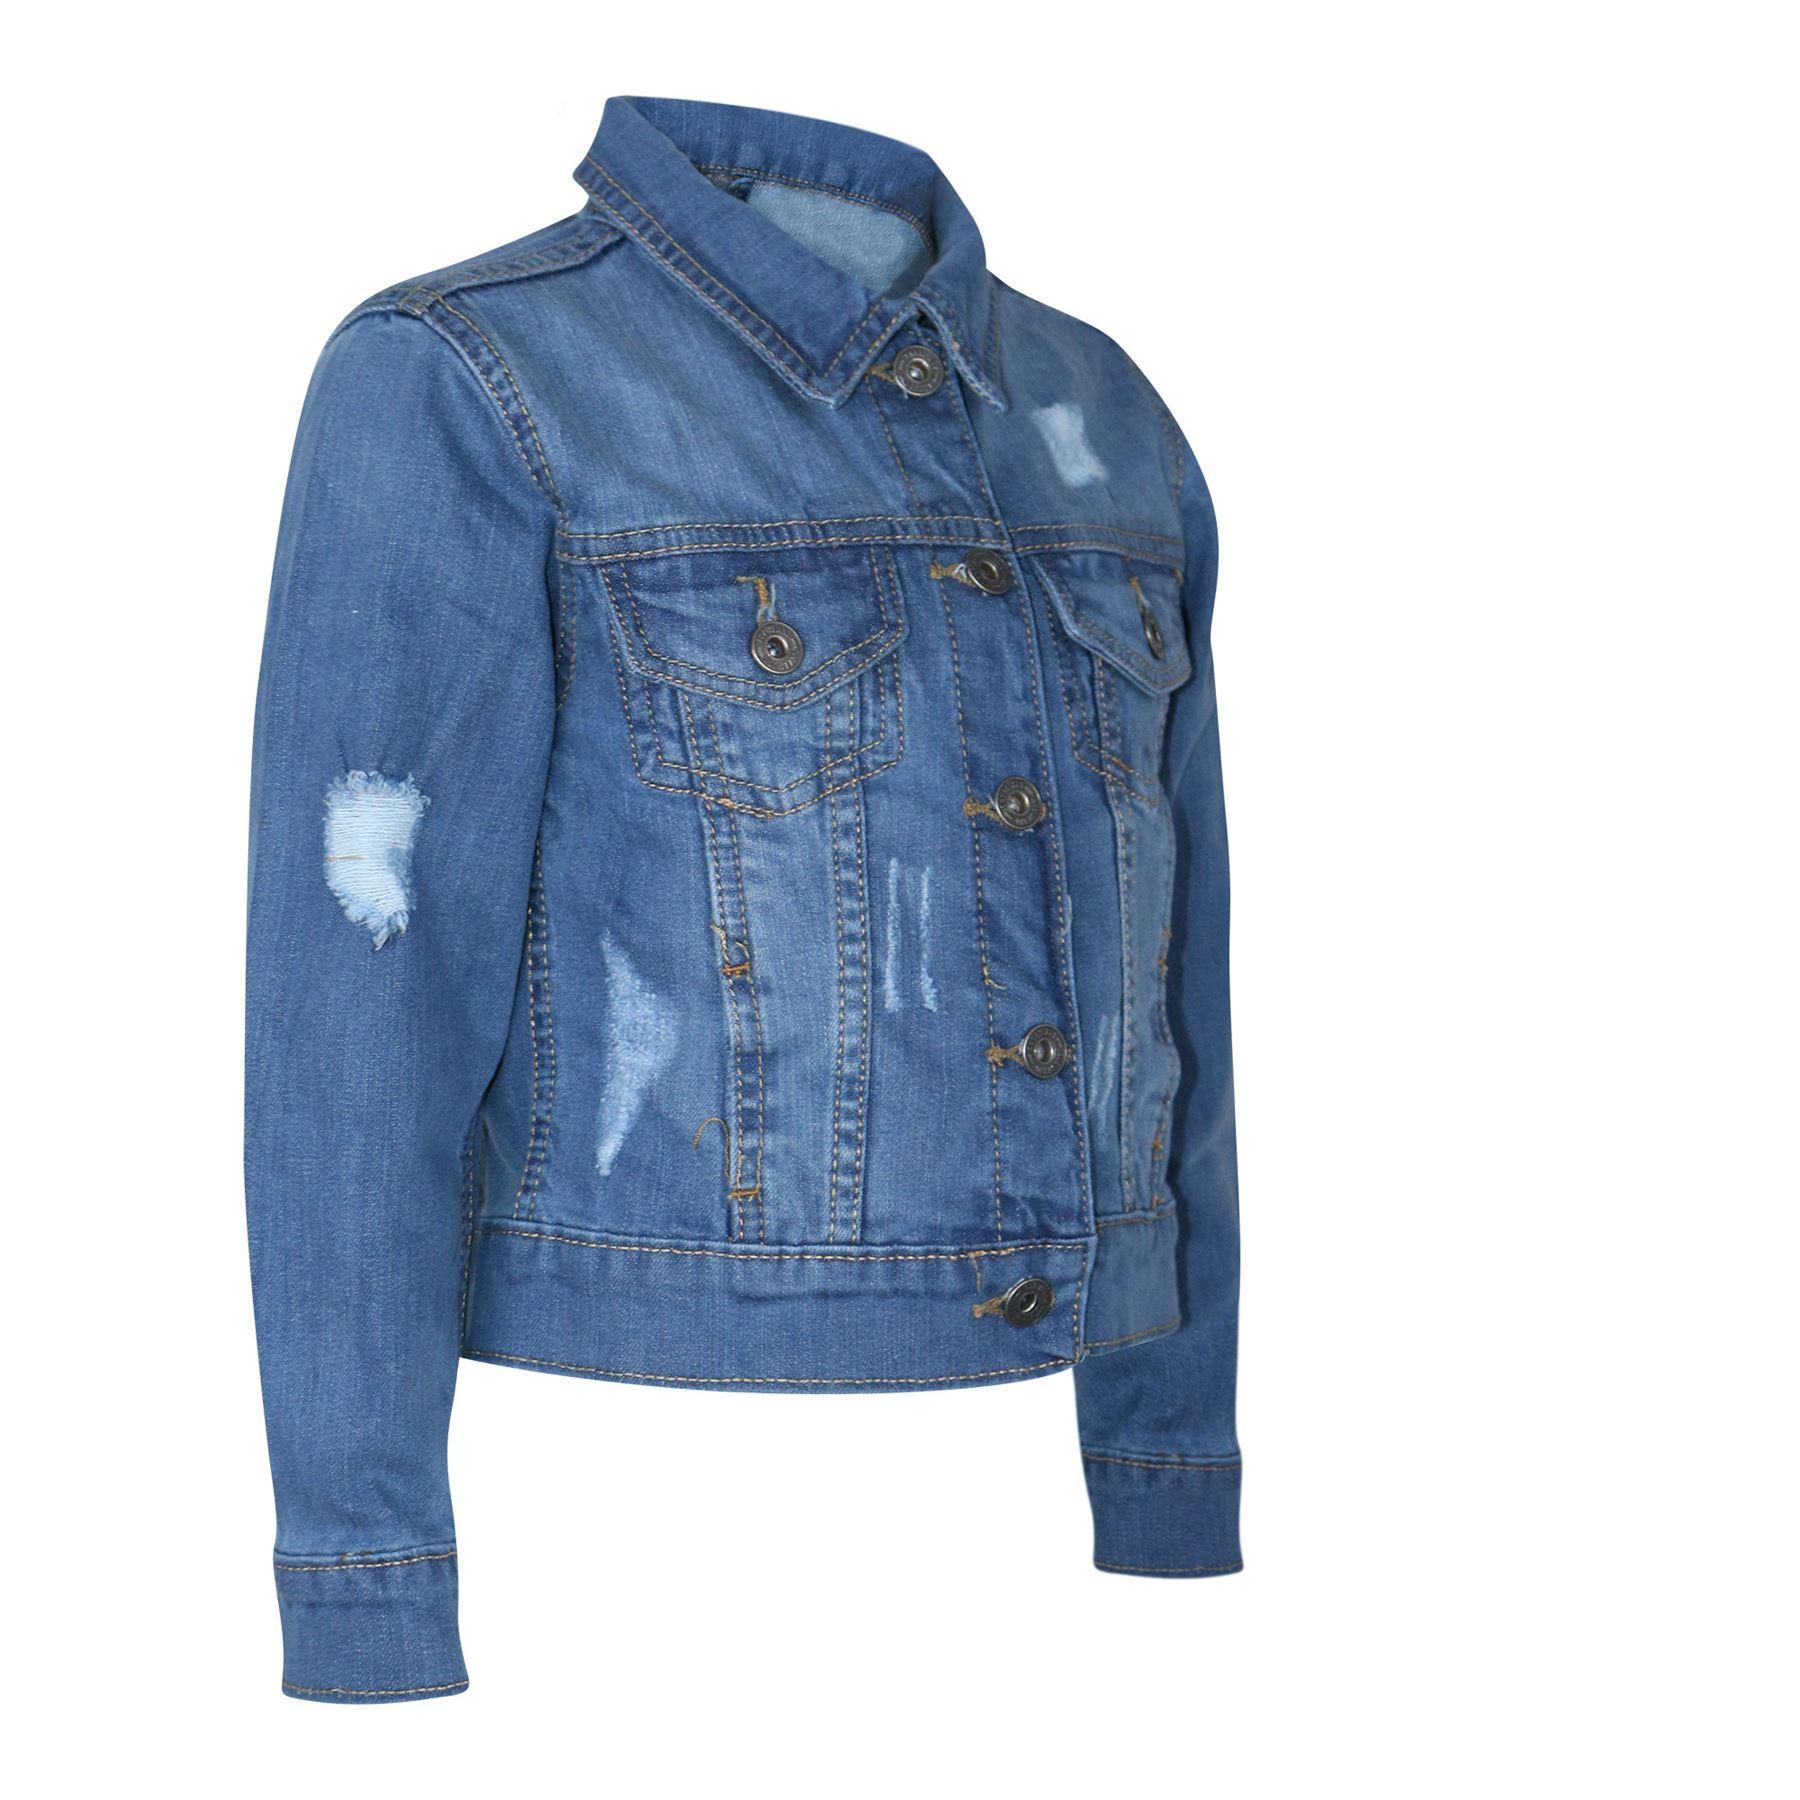 Kids Boys Denim Jacket Designer Ripped Jeans Fashion Jackets Coat Age 3-13 Years